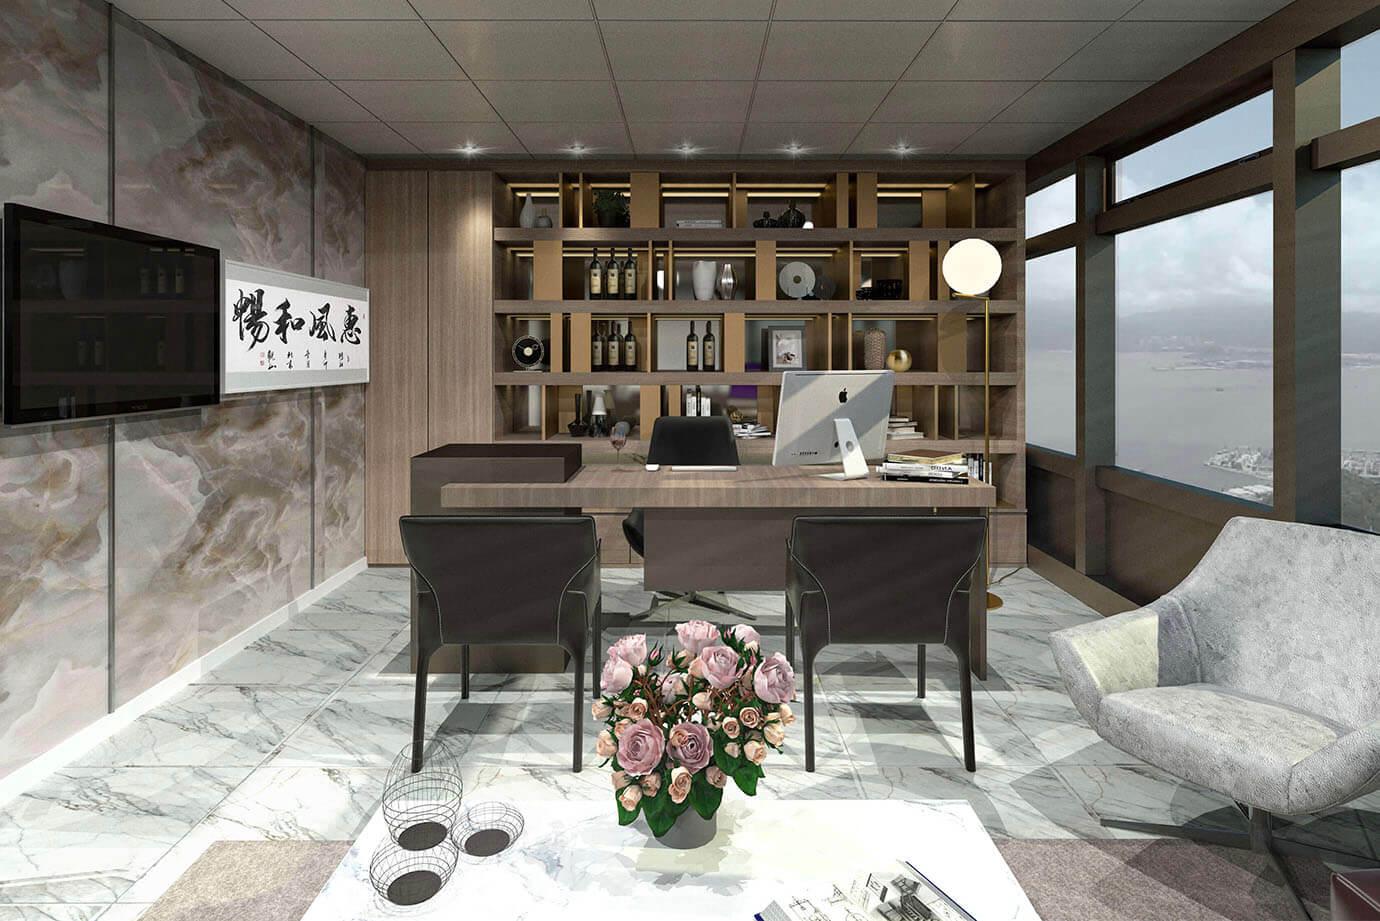 Inch Interior Design Hong Kong Lippo Sun Plaza